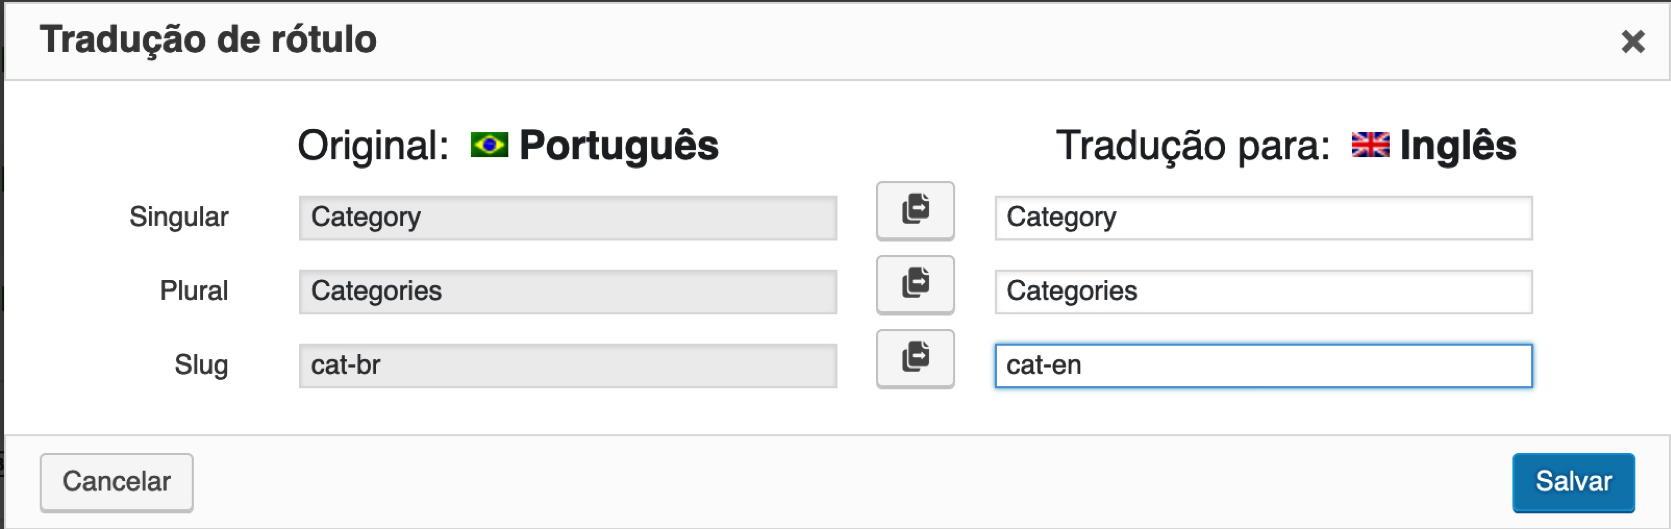 category-translation-error-detail.jpg